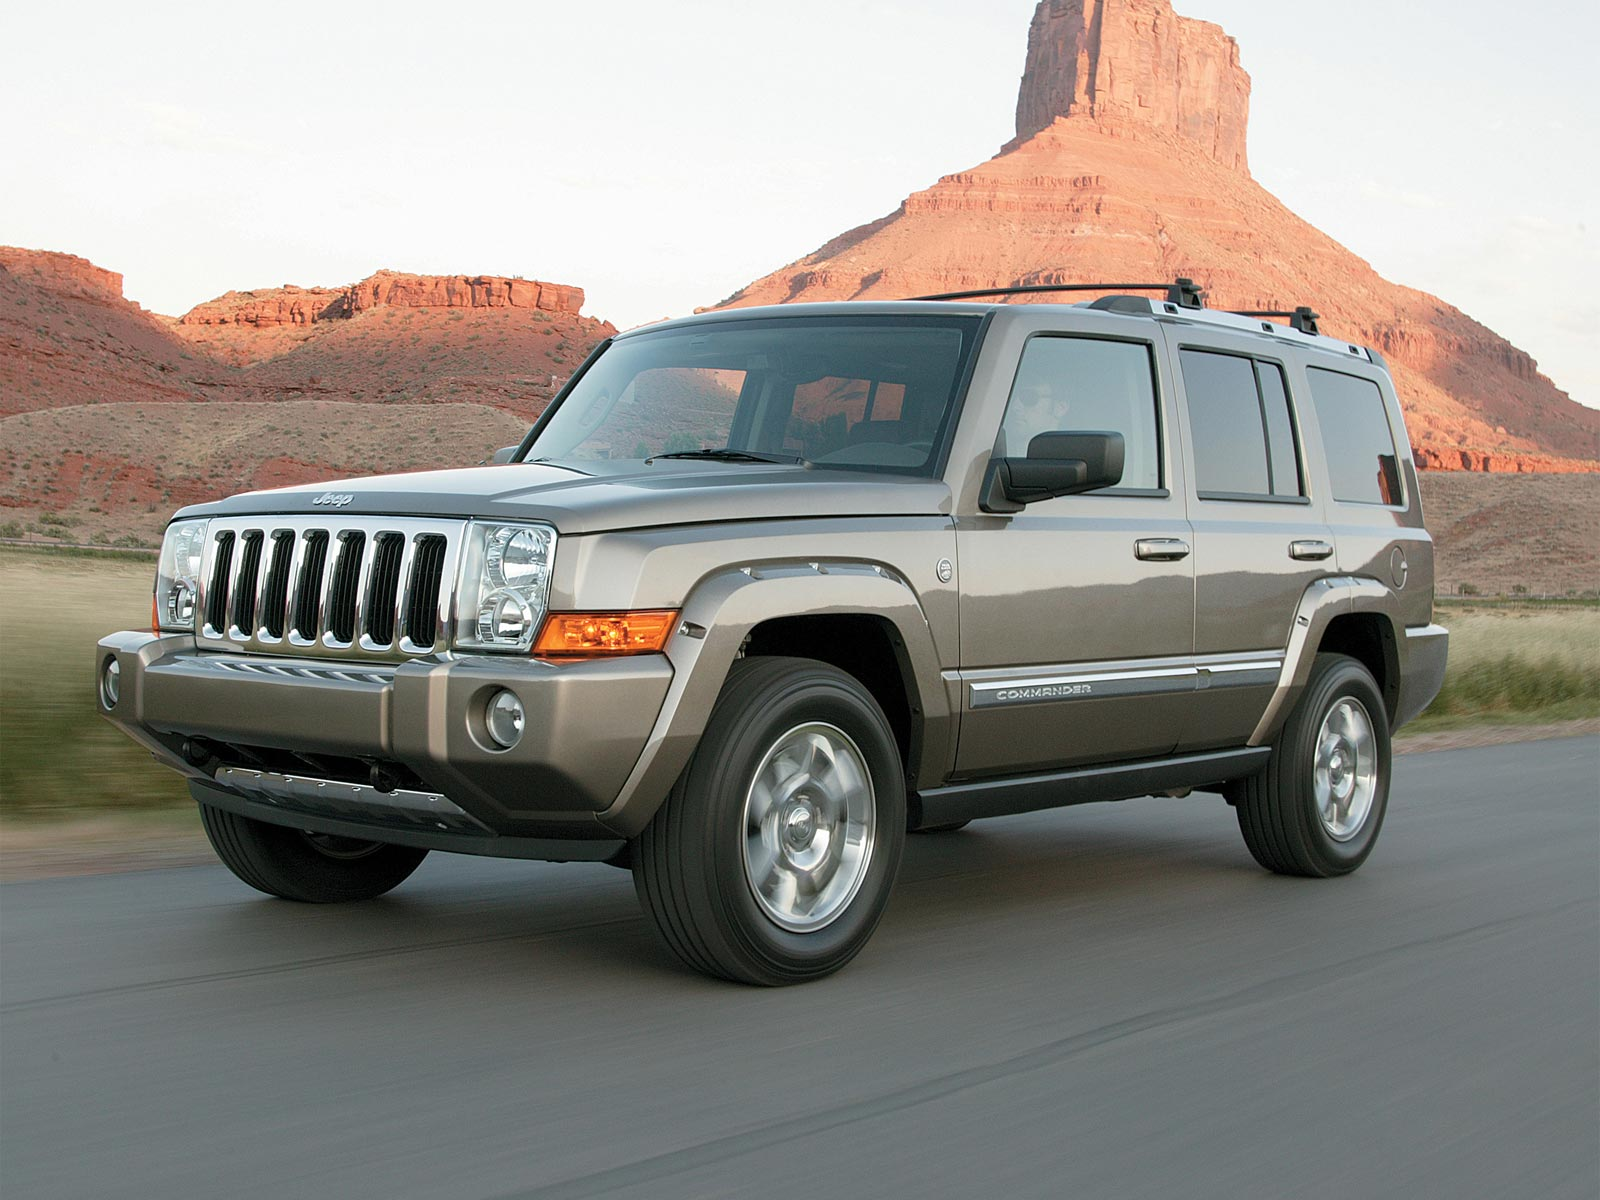 2006 2010 jeep commander autoguru. Black Bedroom Furniture Sets. Home Design Ideas